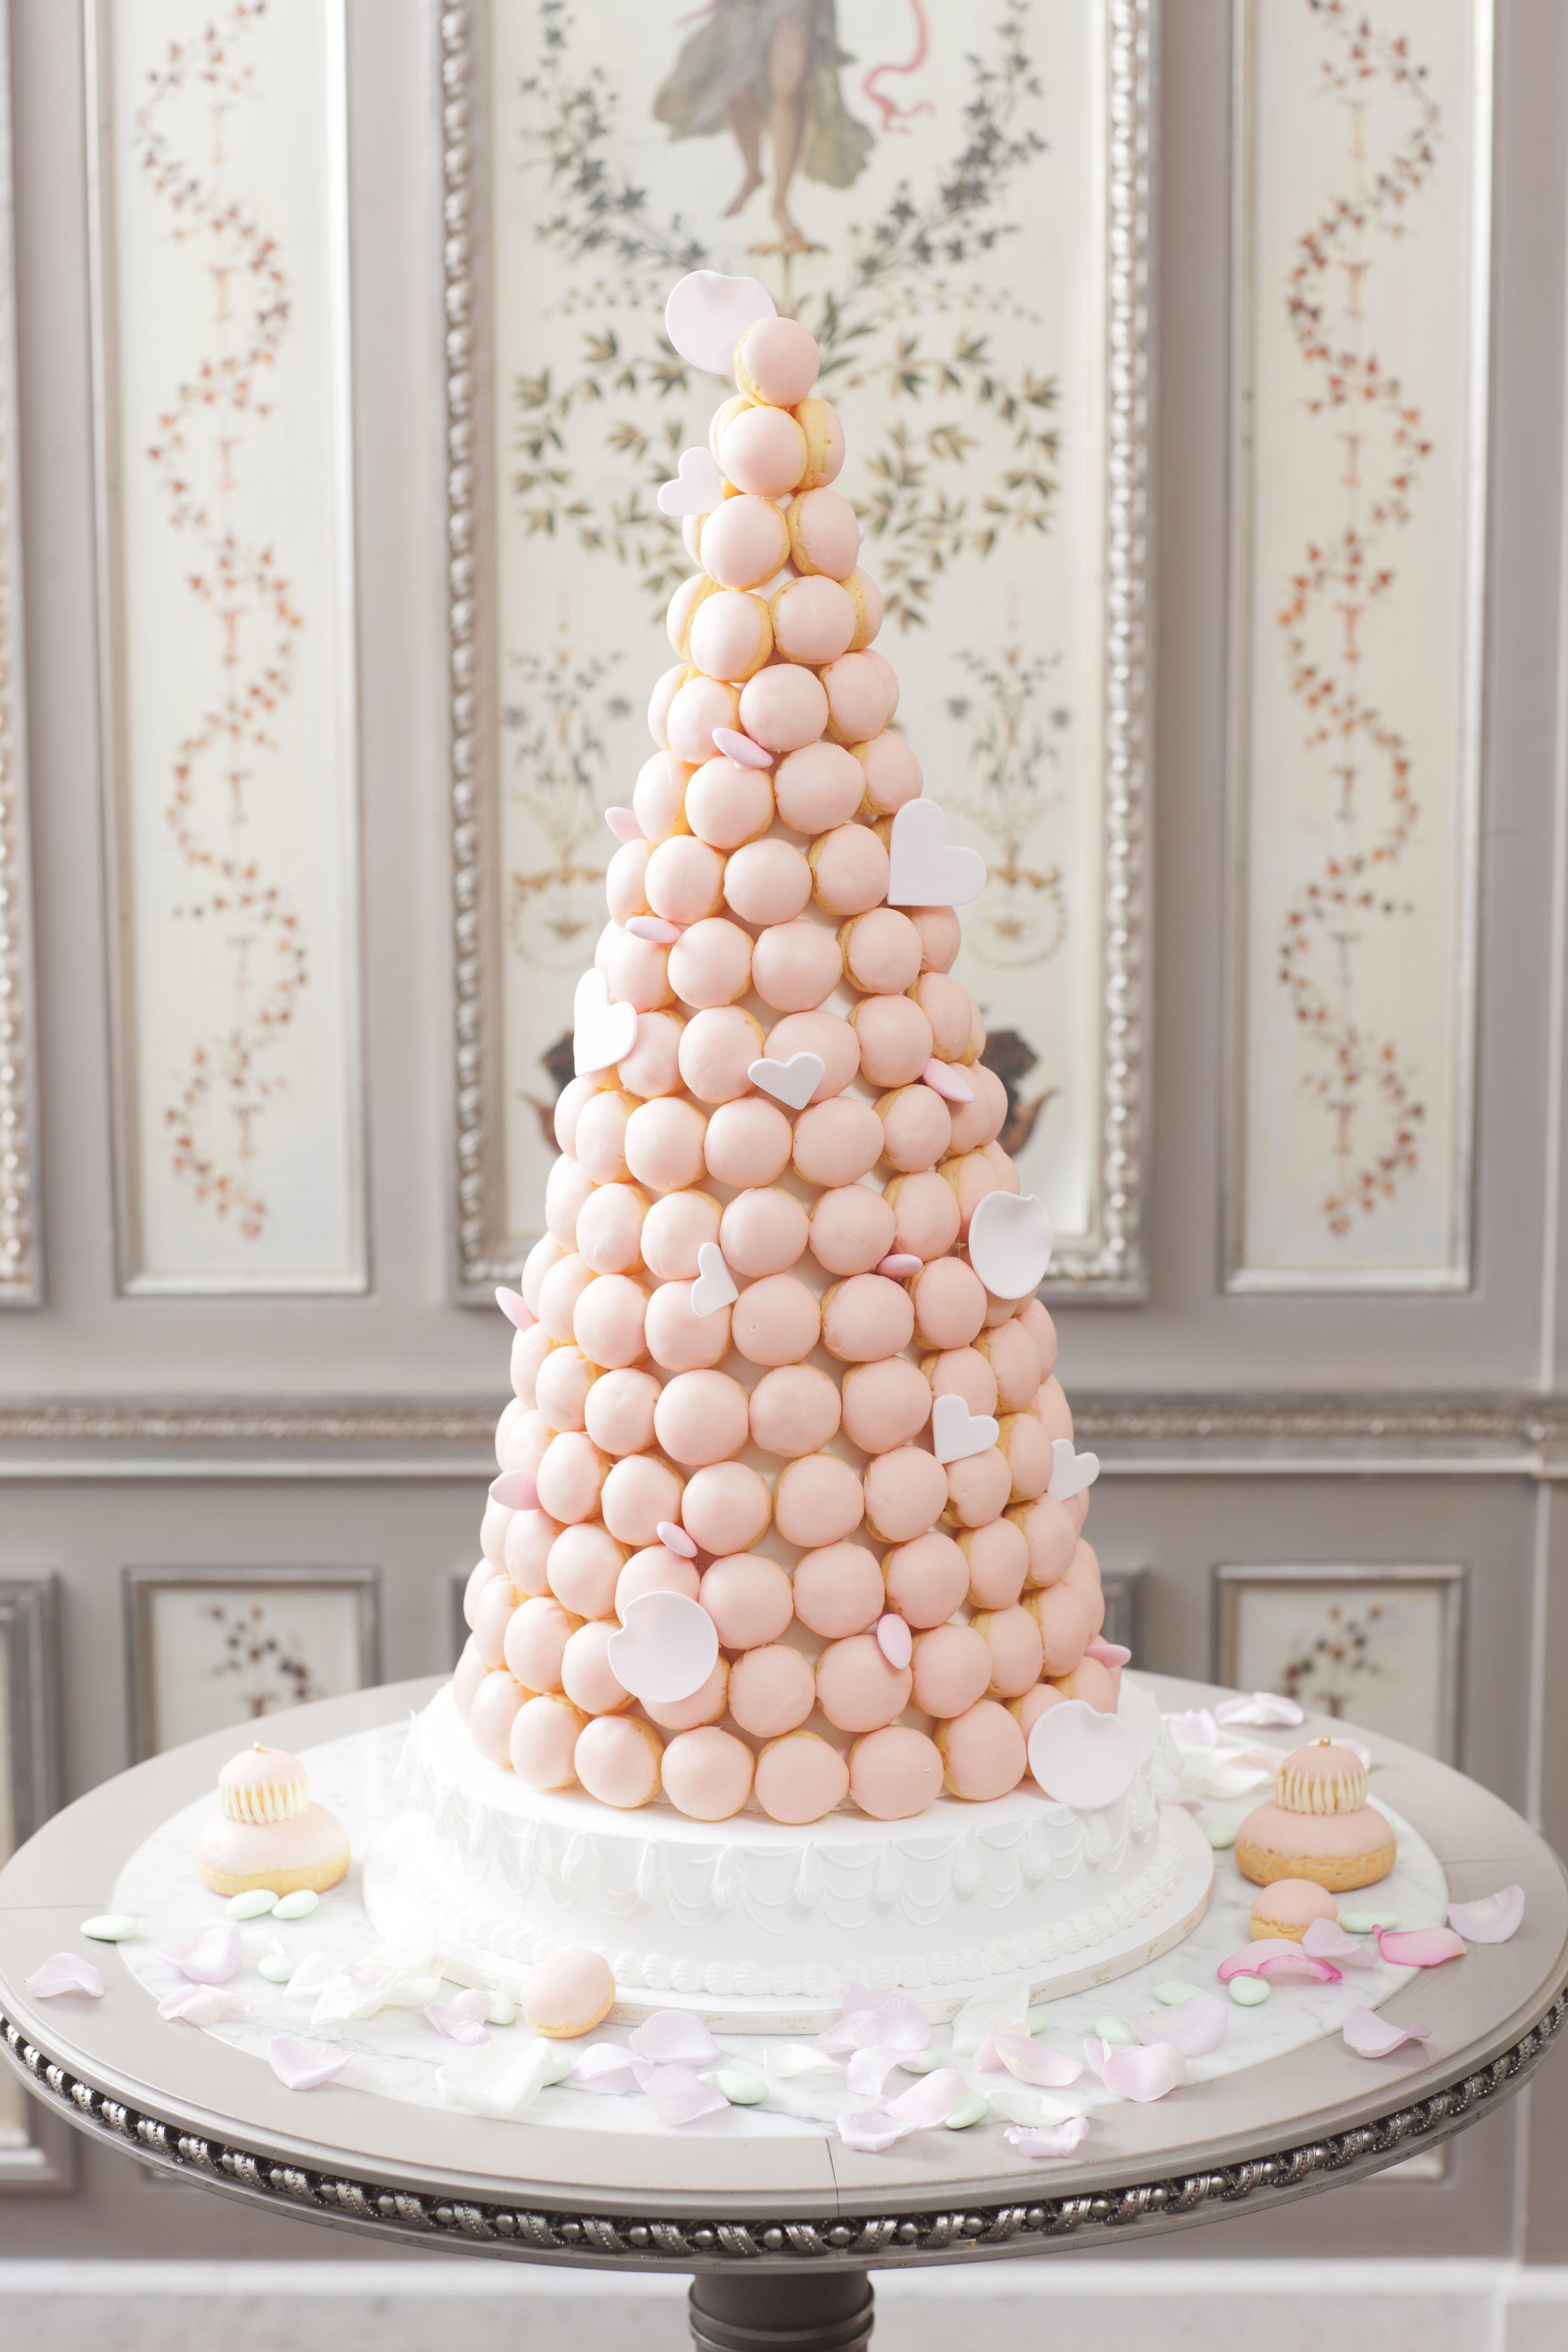 Maison Laduree Paris Macaron Pyramid Laduree Macaron Macaron